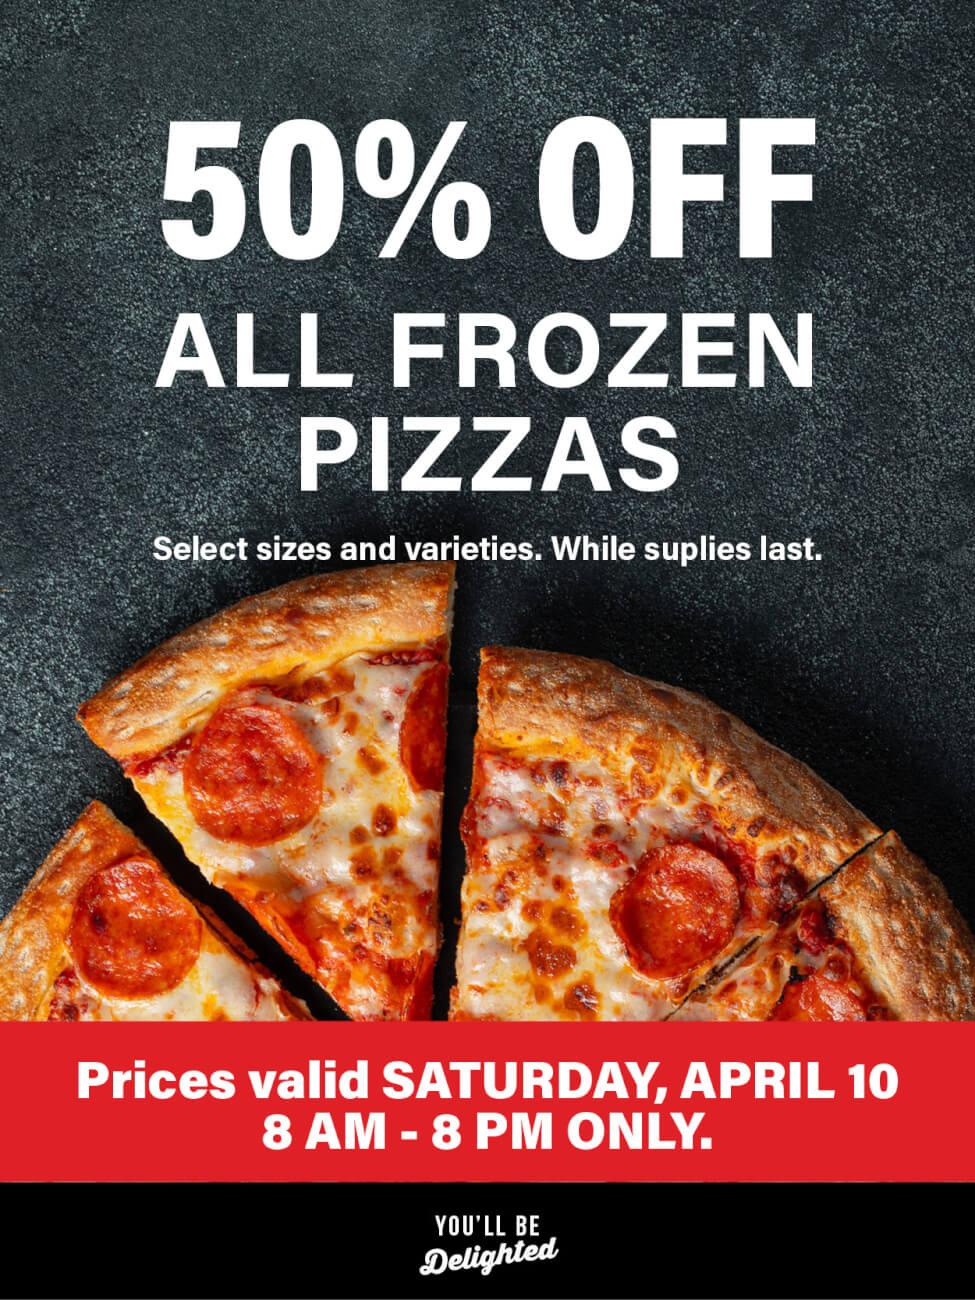 50% off frozen pizza!